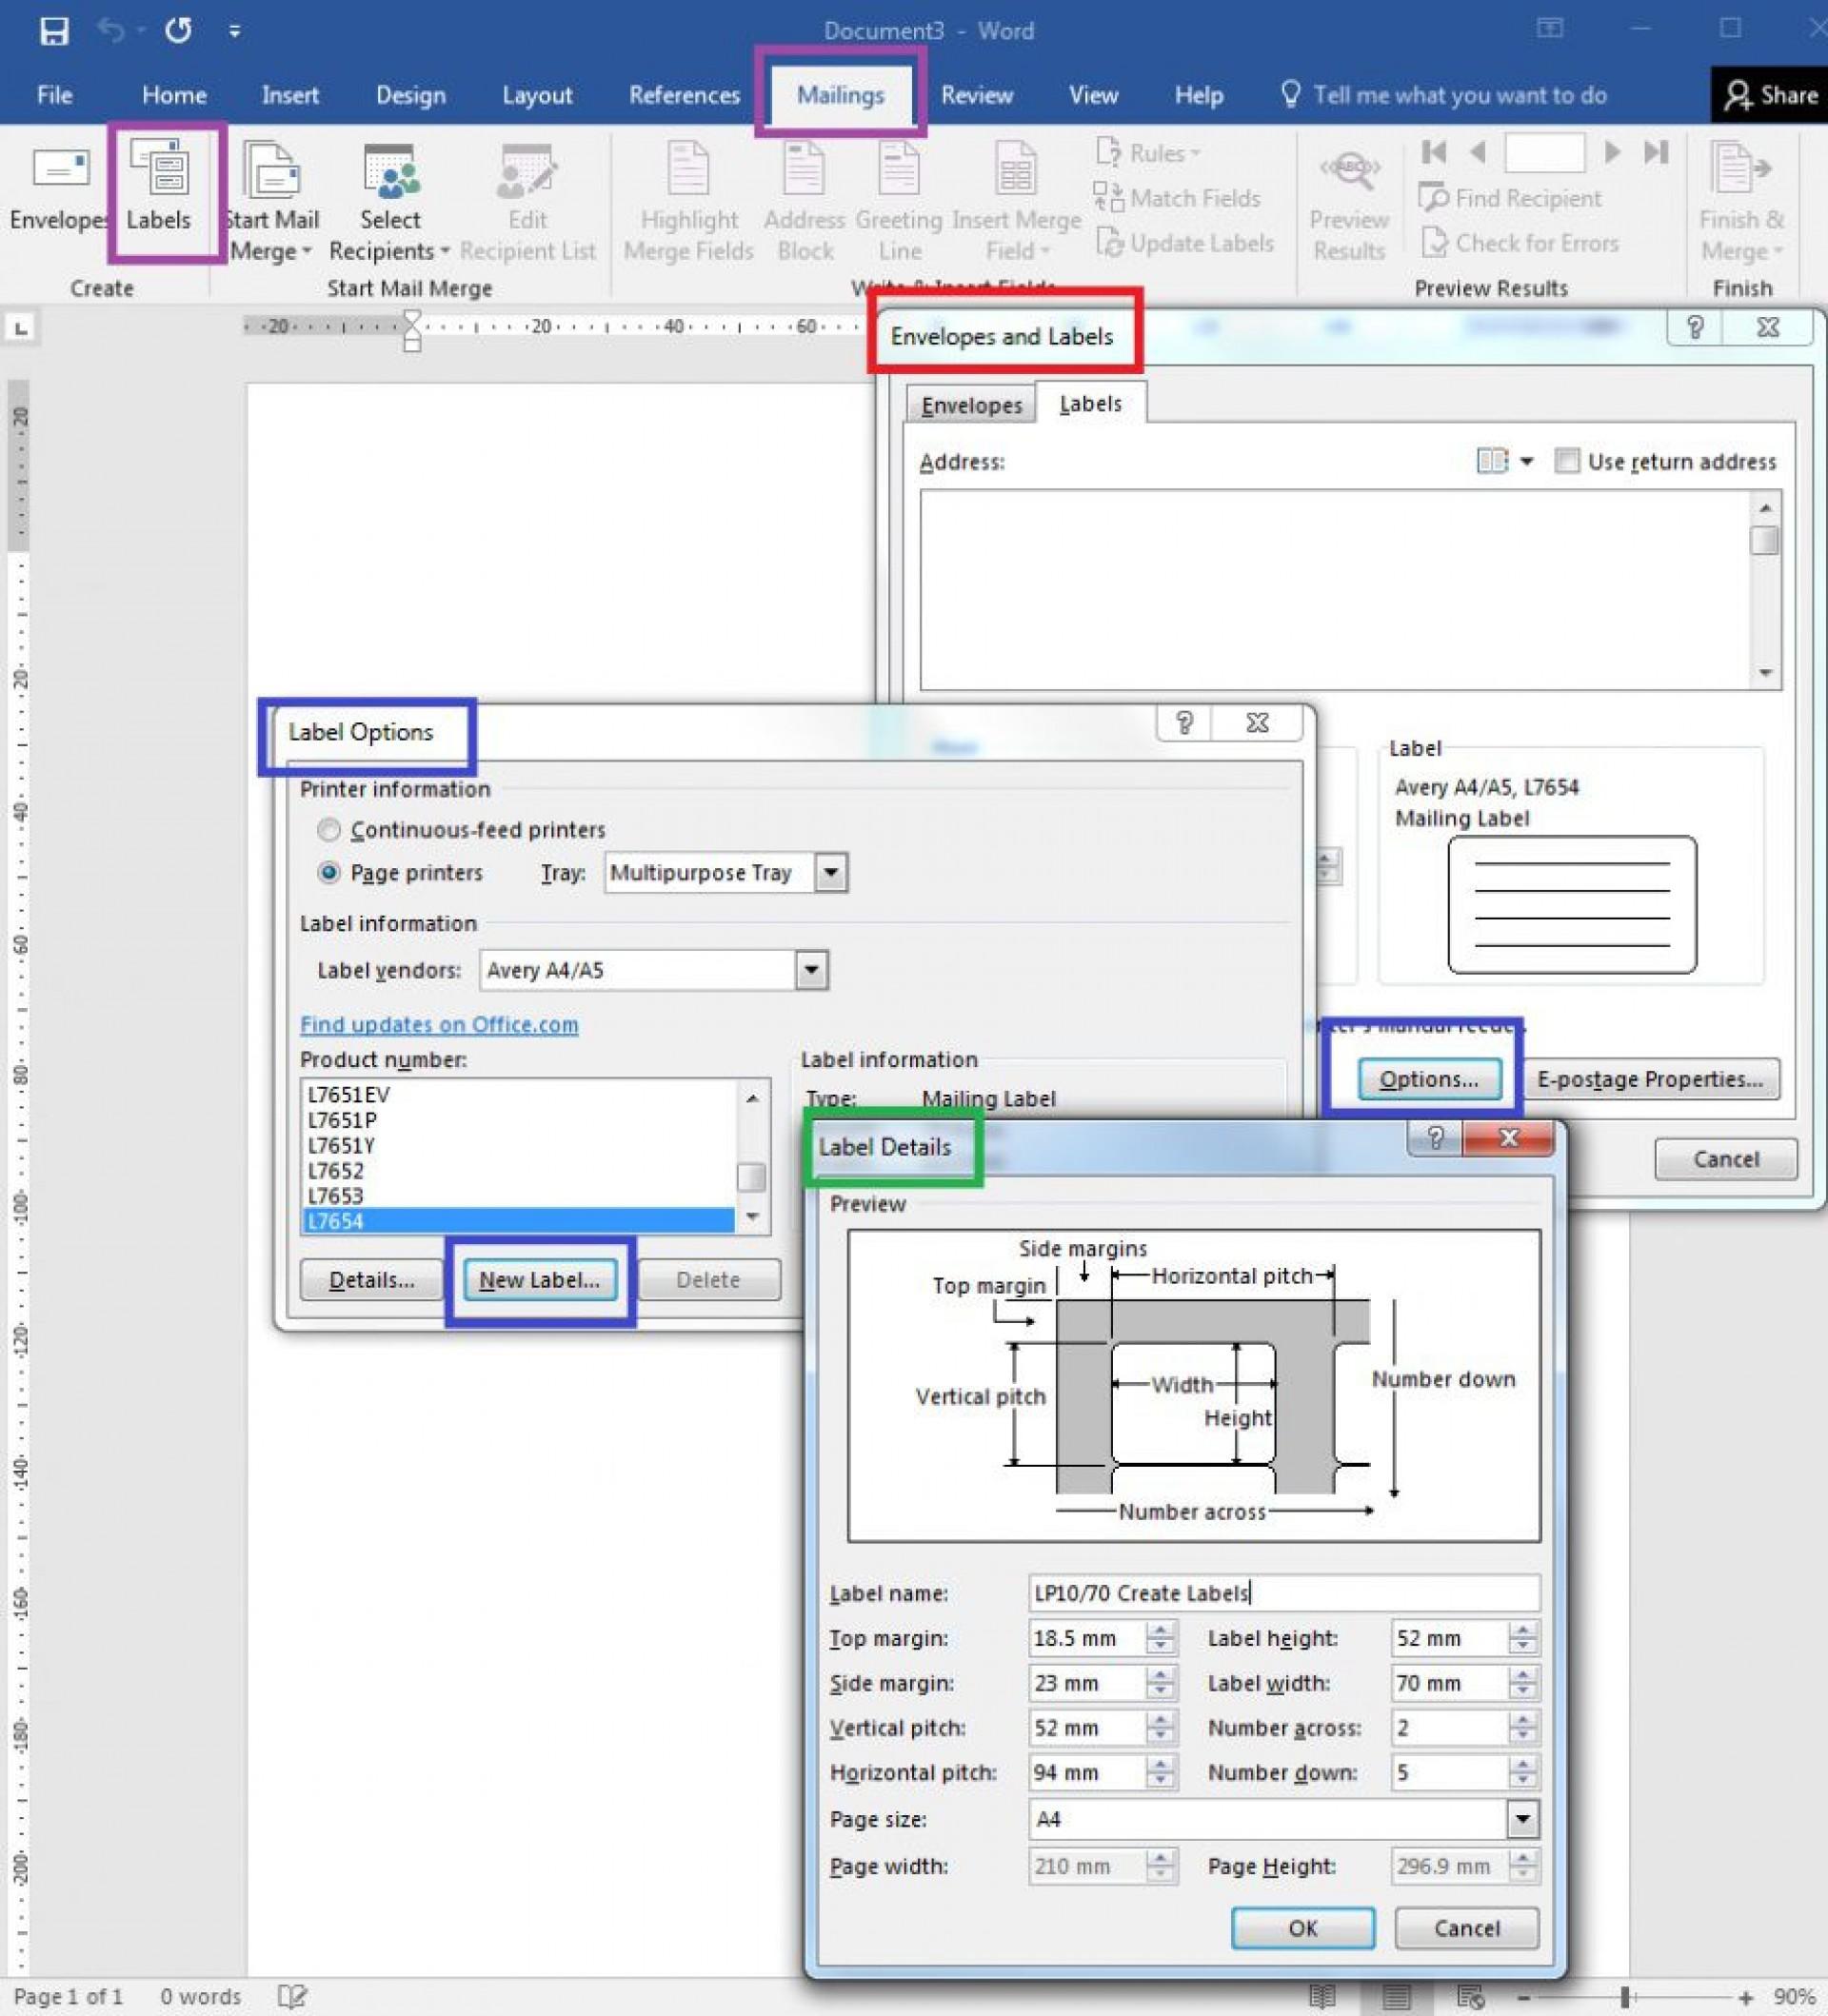 006 Stunning Microsoft Word Addres Label Template Photo  30 Per Sheet 14 161920